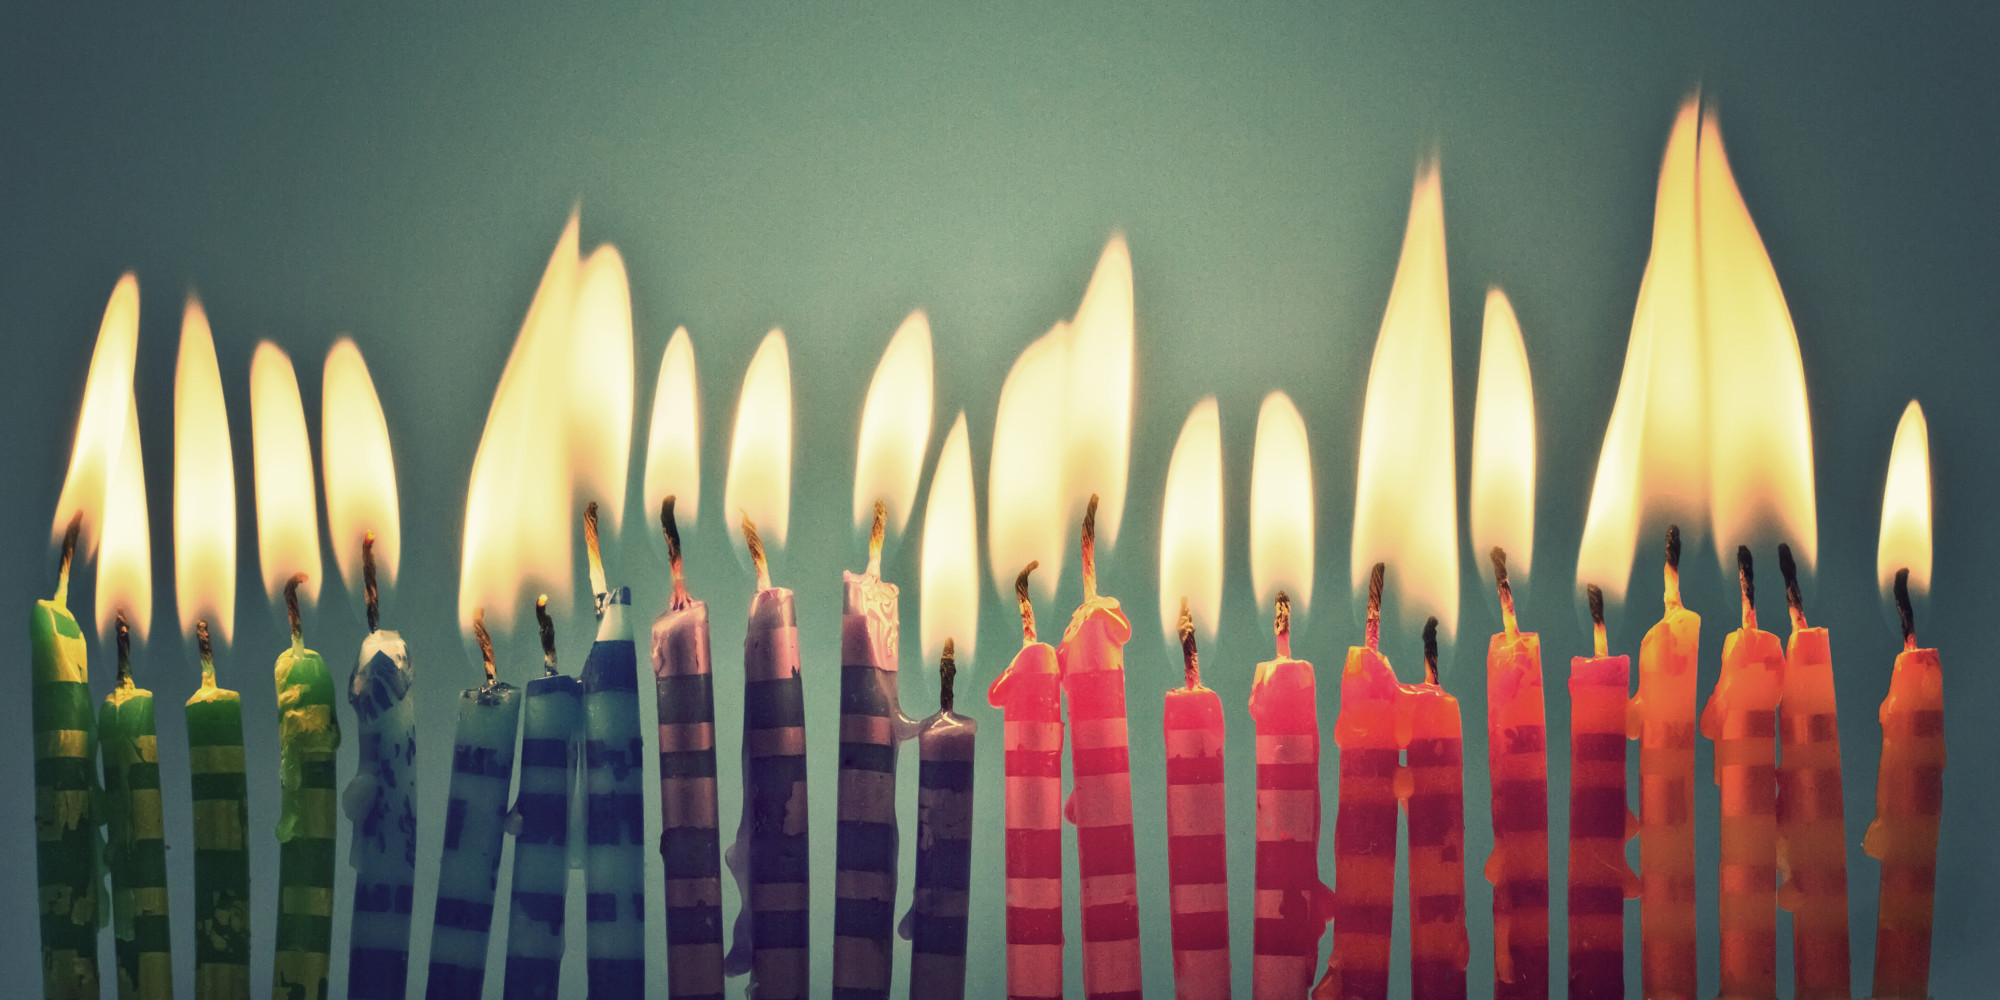 Green Birthday Cake Candles